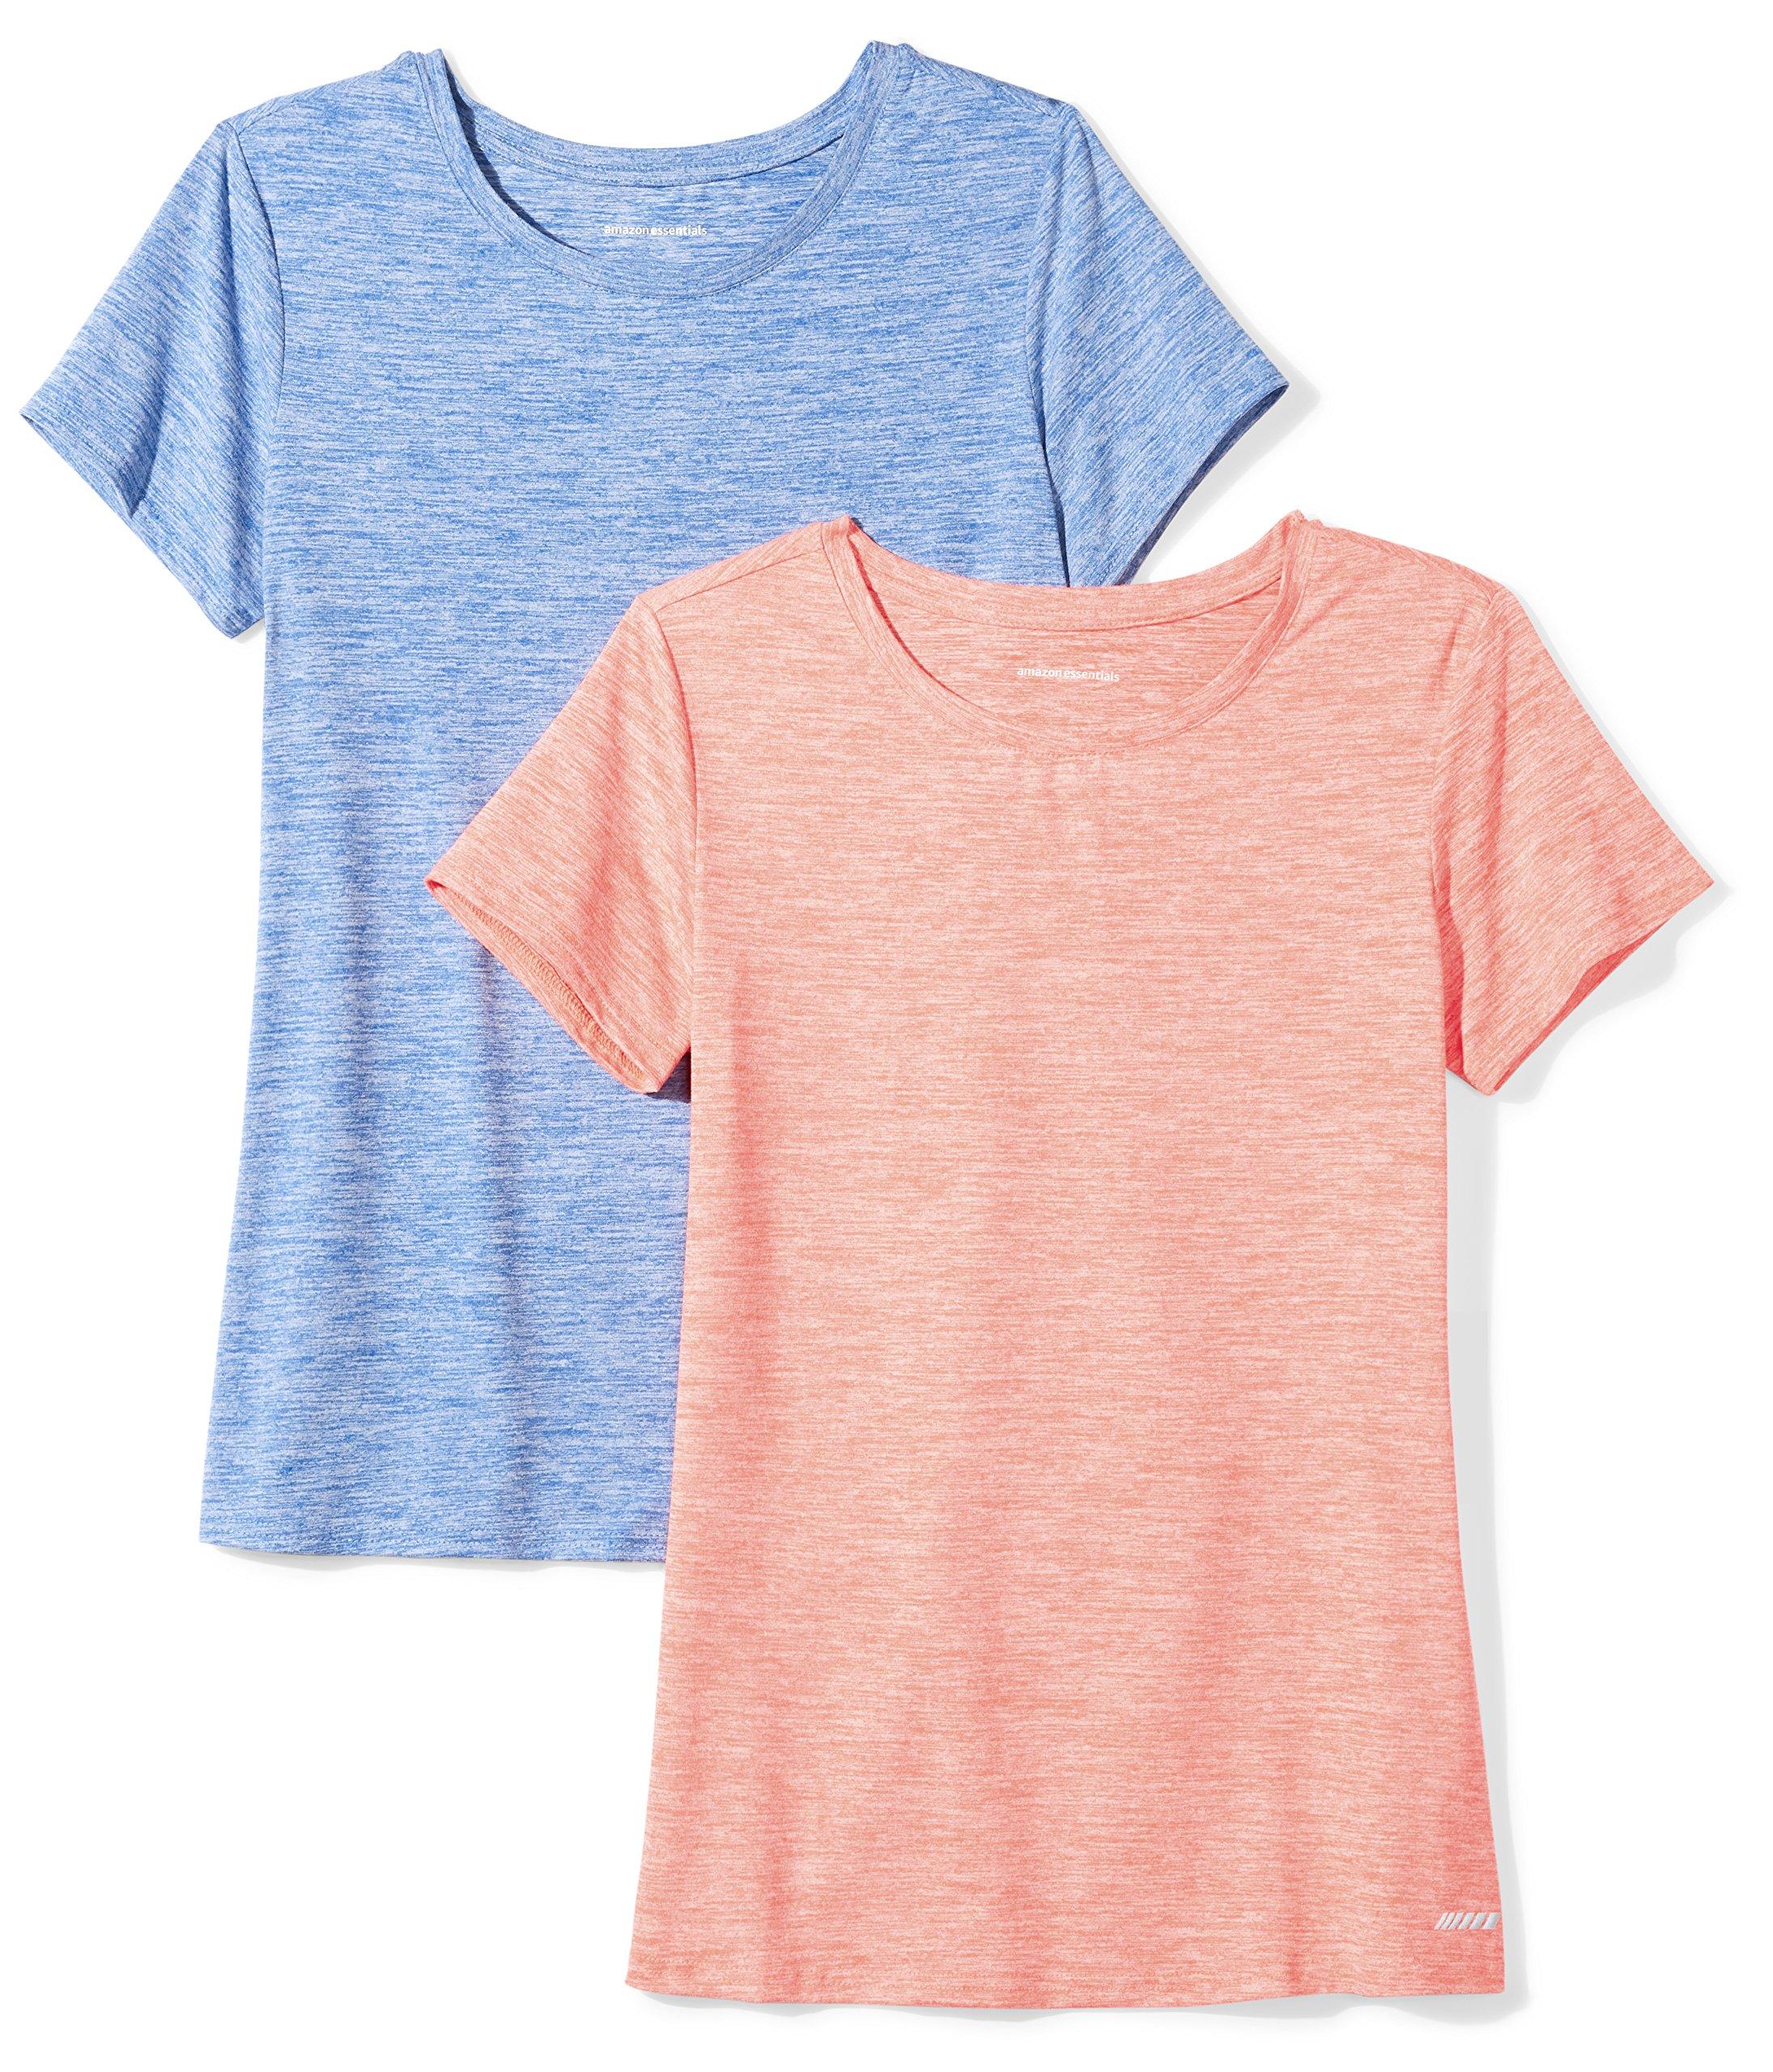 Amazon Essentials Women's 2-Pack Tech Stretch Short-Sleeve Crewneck T-Shirt, -fiery coral heather/cobalt heather, XX-Large by Amazon Essentials